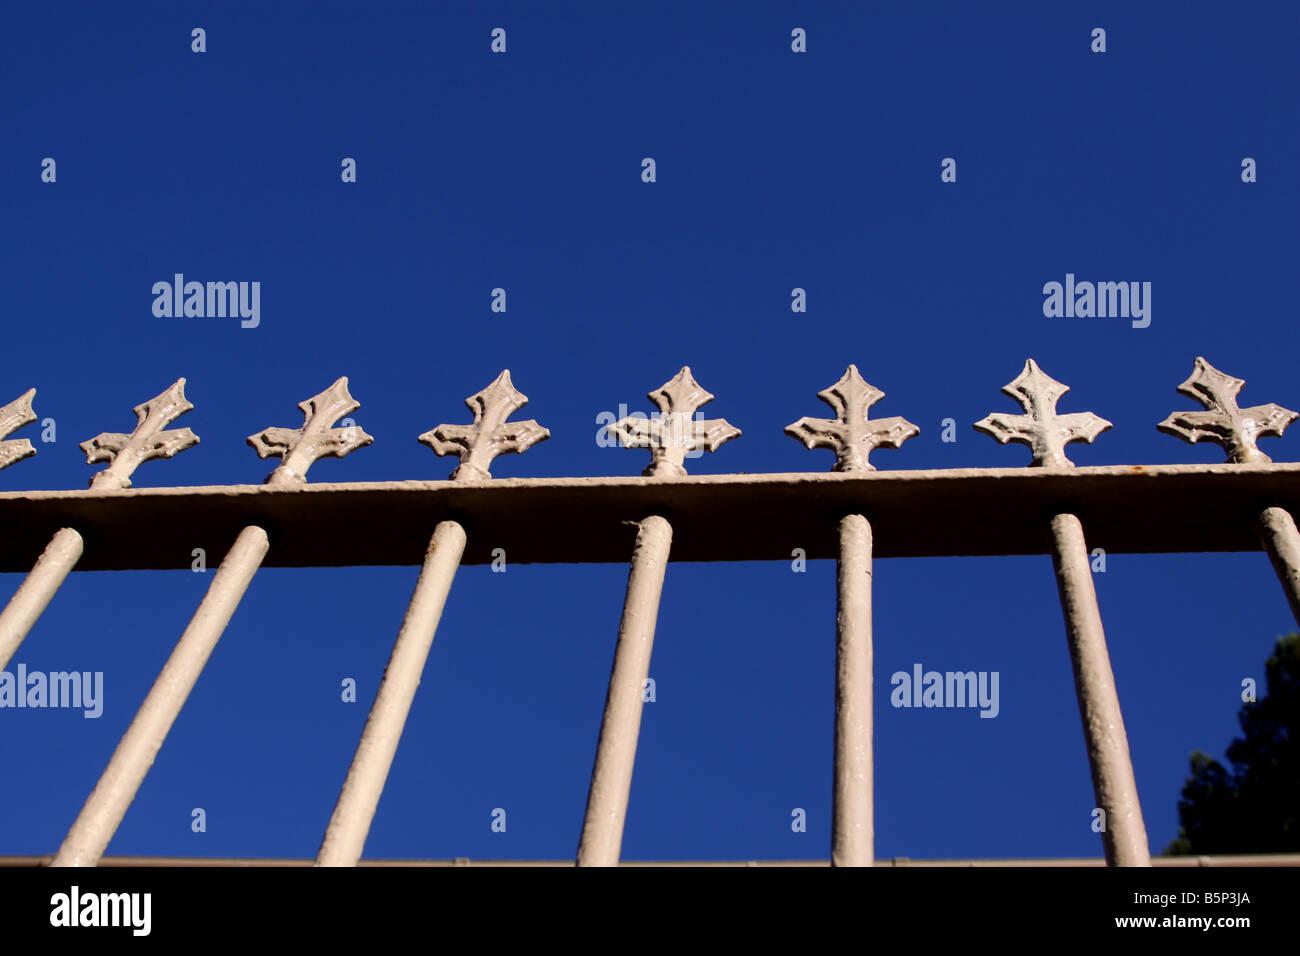 Cast iron railings against blue sky - Stock Image